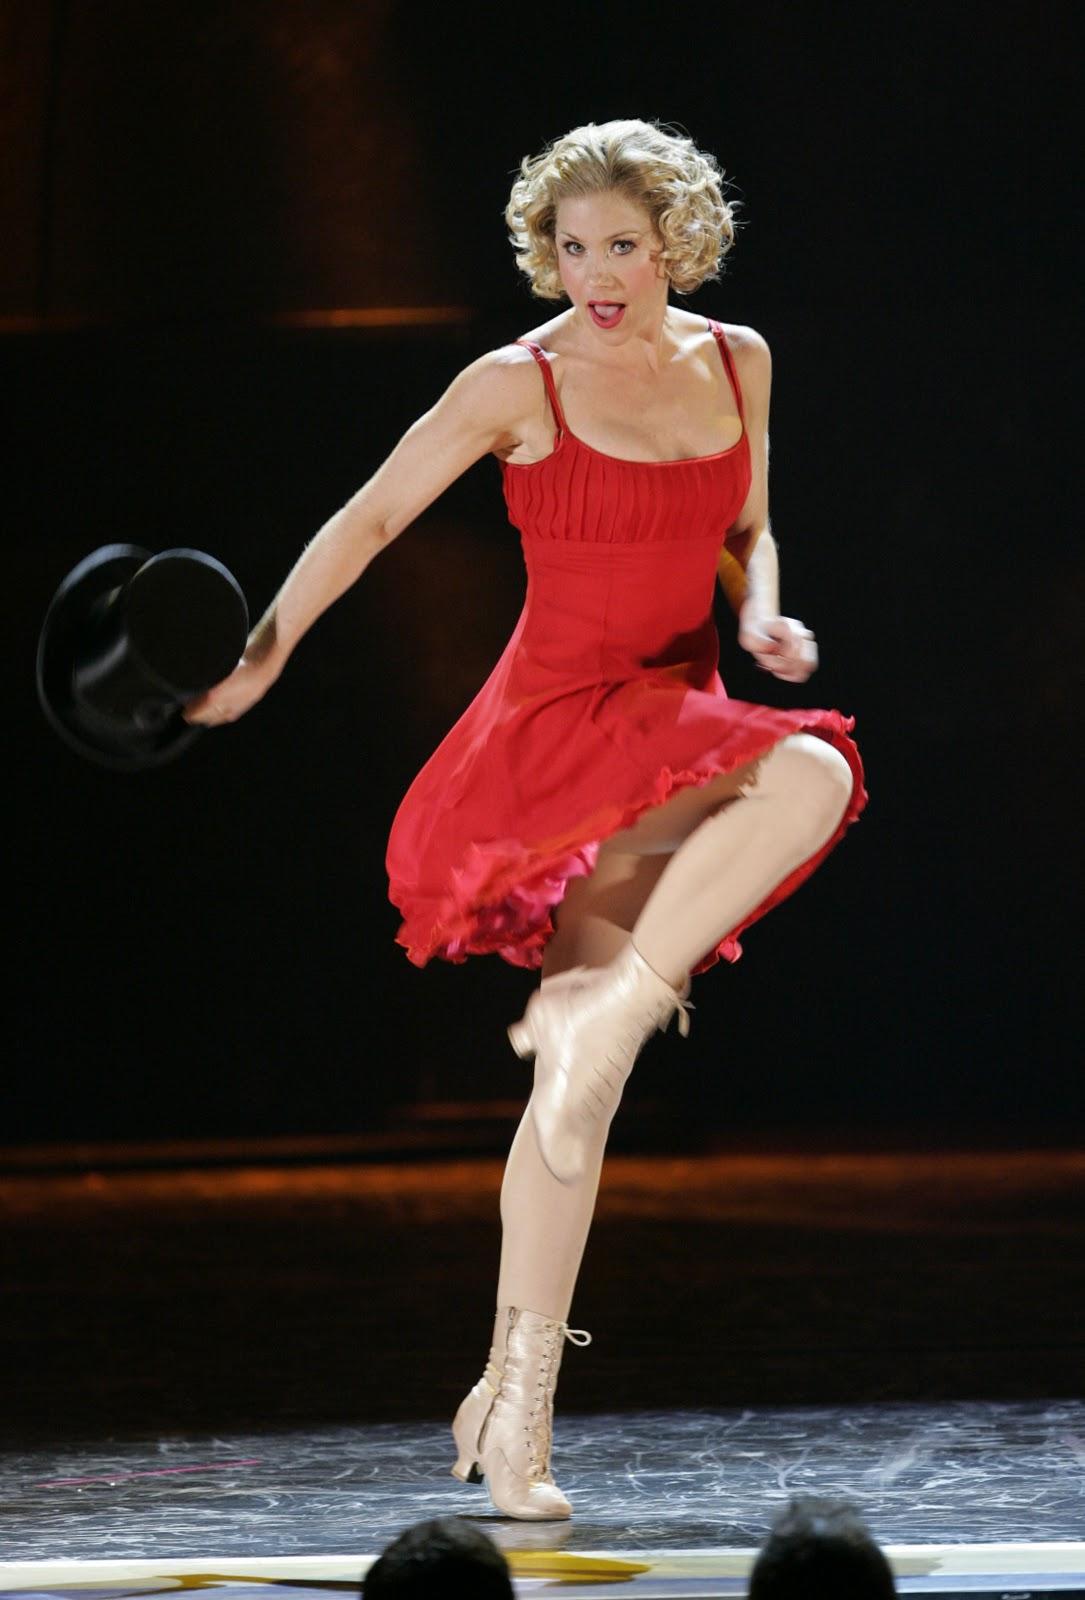 http://3.bp.blogspot.com/-lvdoZx3mRMA/TpDYPTlS7VI/AAAAAAAABV8/OIlH-pNJ95w/s1600/christina_applegate_2005_tony_awards_08.jpg